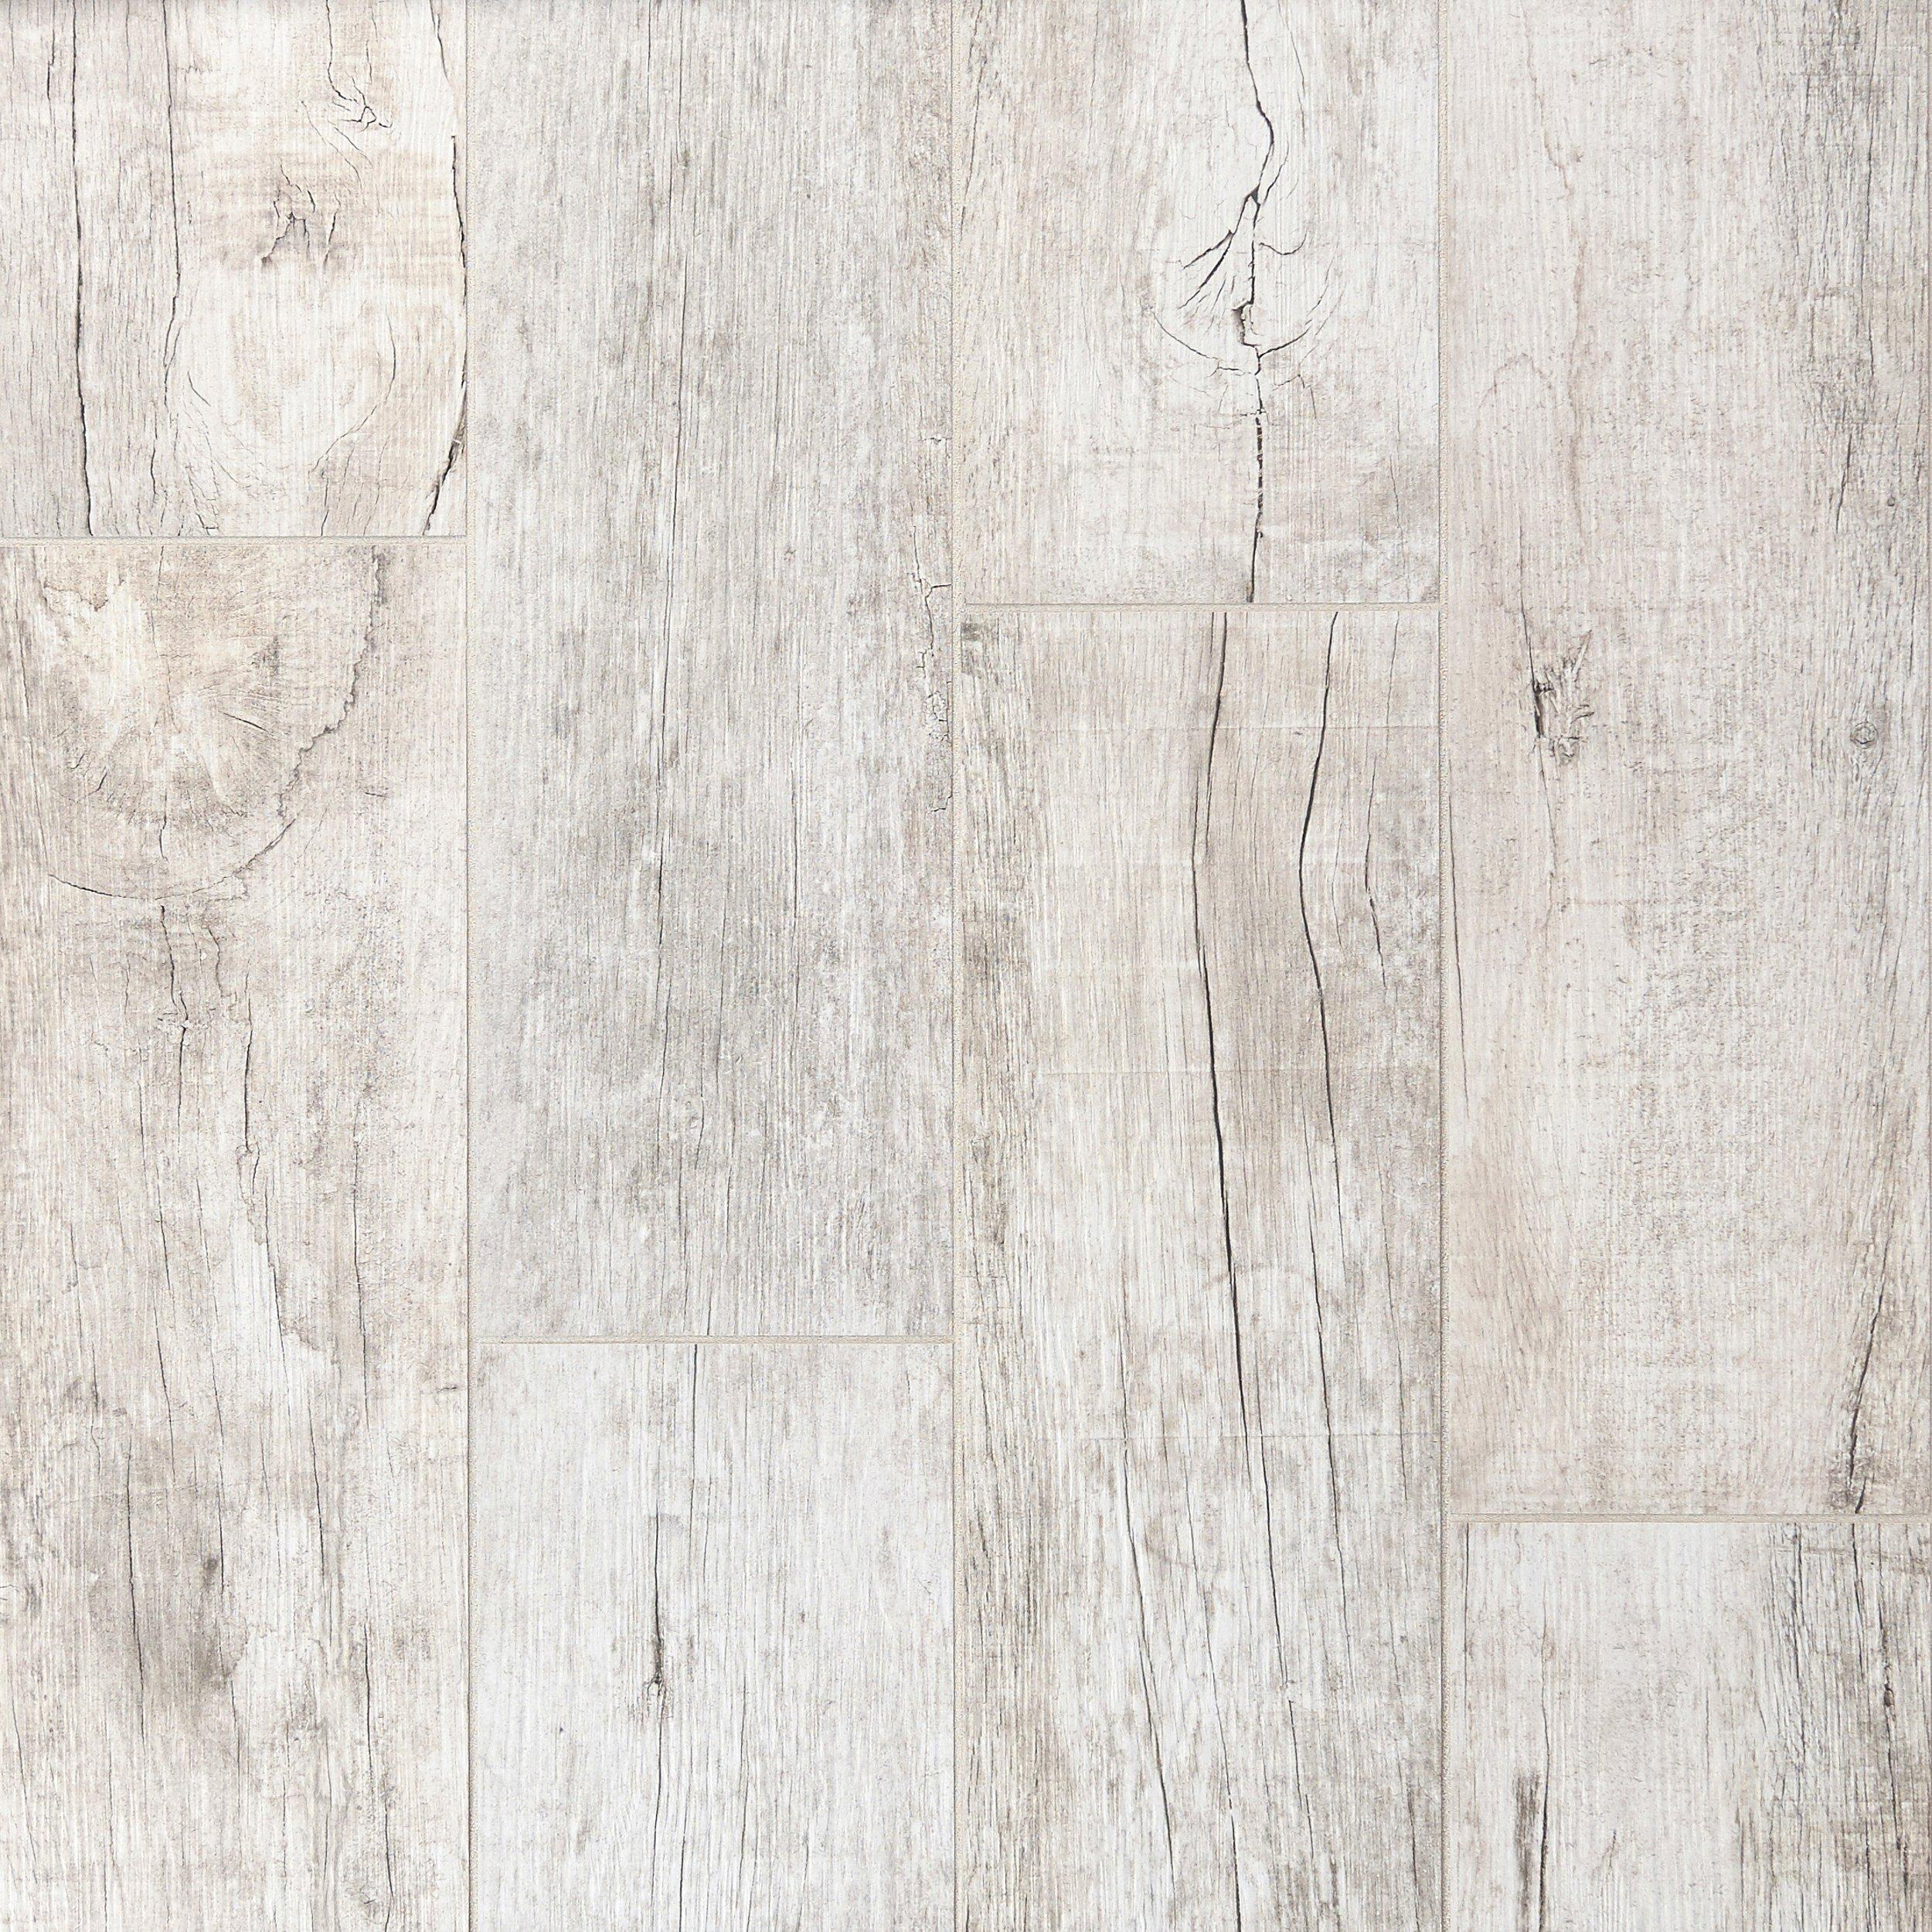 Frontier Light Wood Plank Porcelain Tile   8 X 48   100198779 | Floor And  Decor